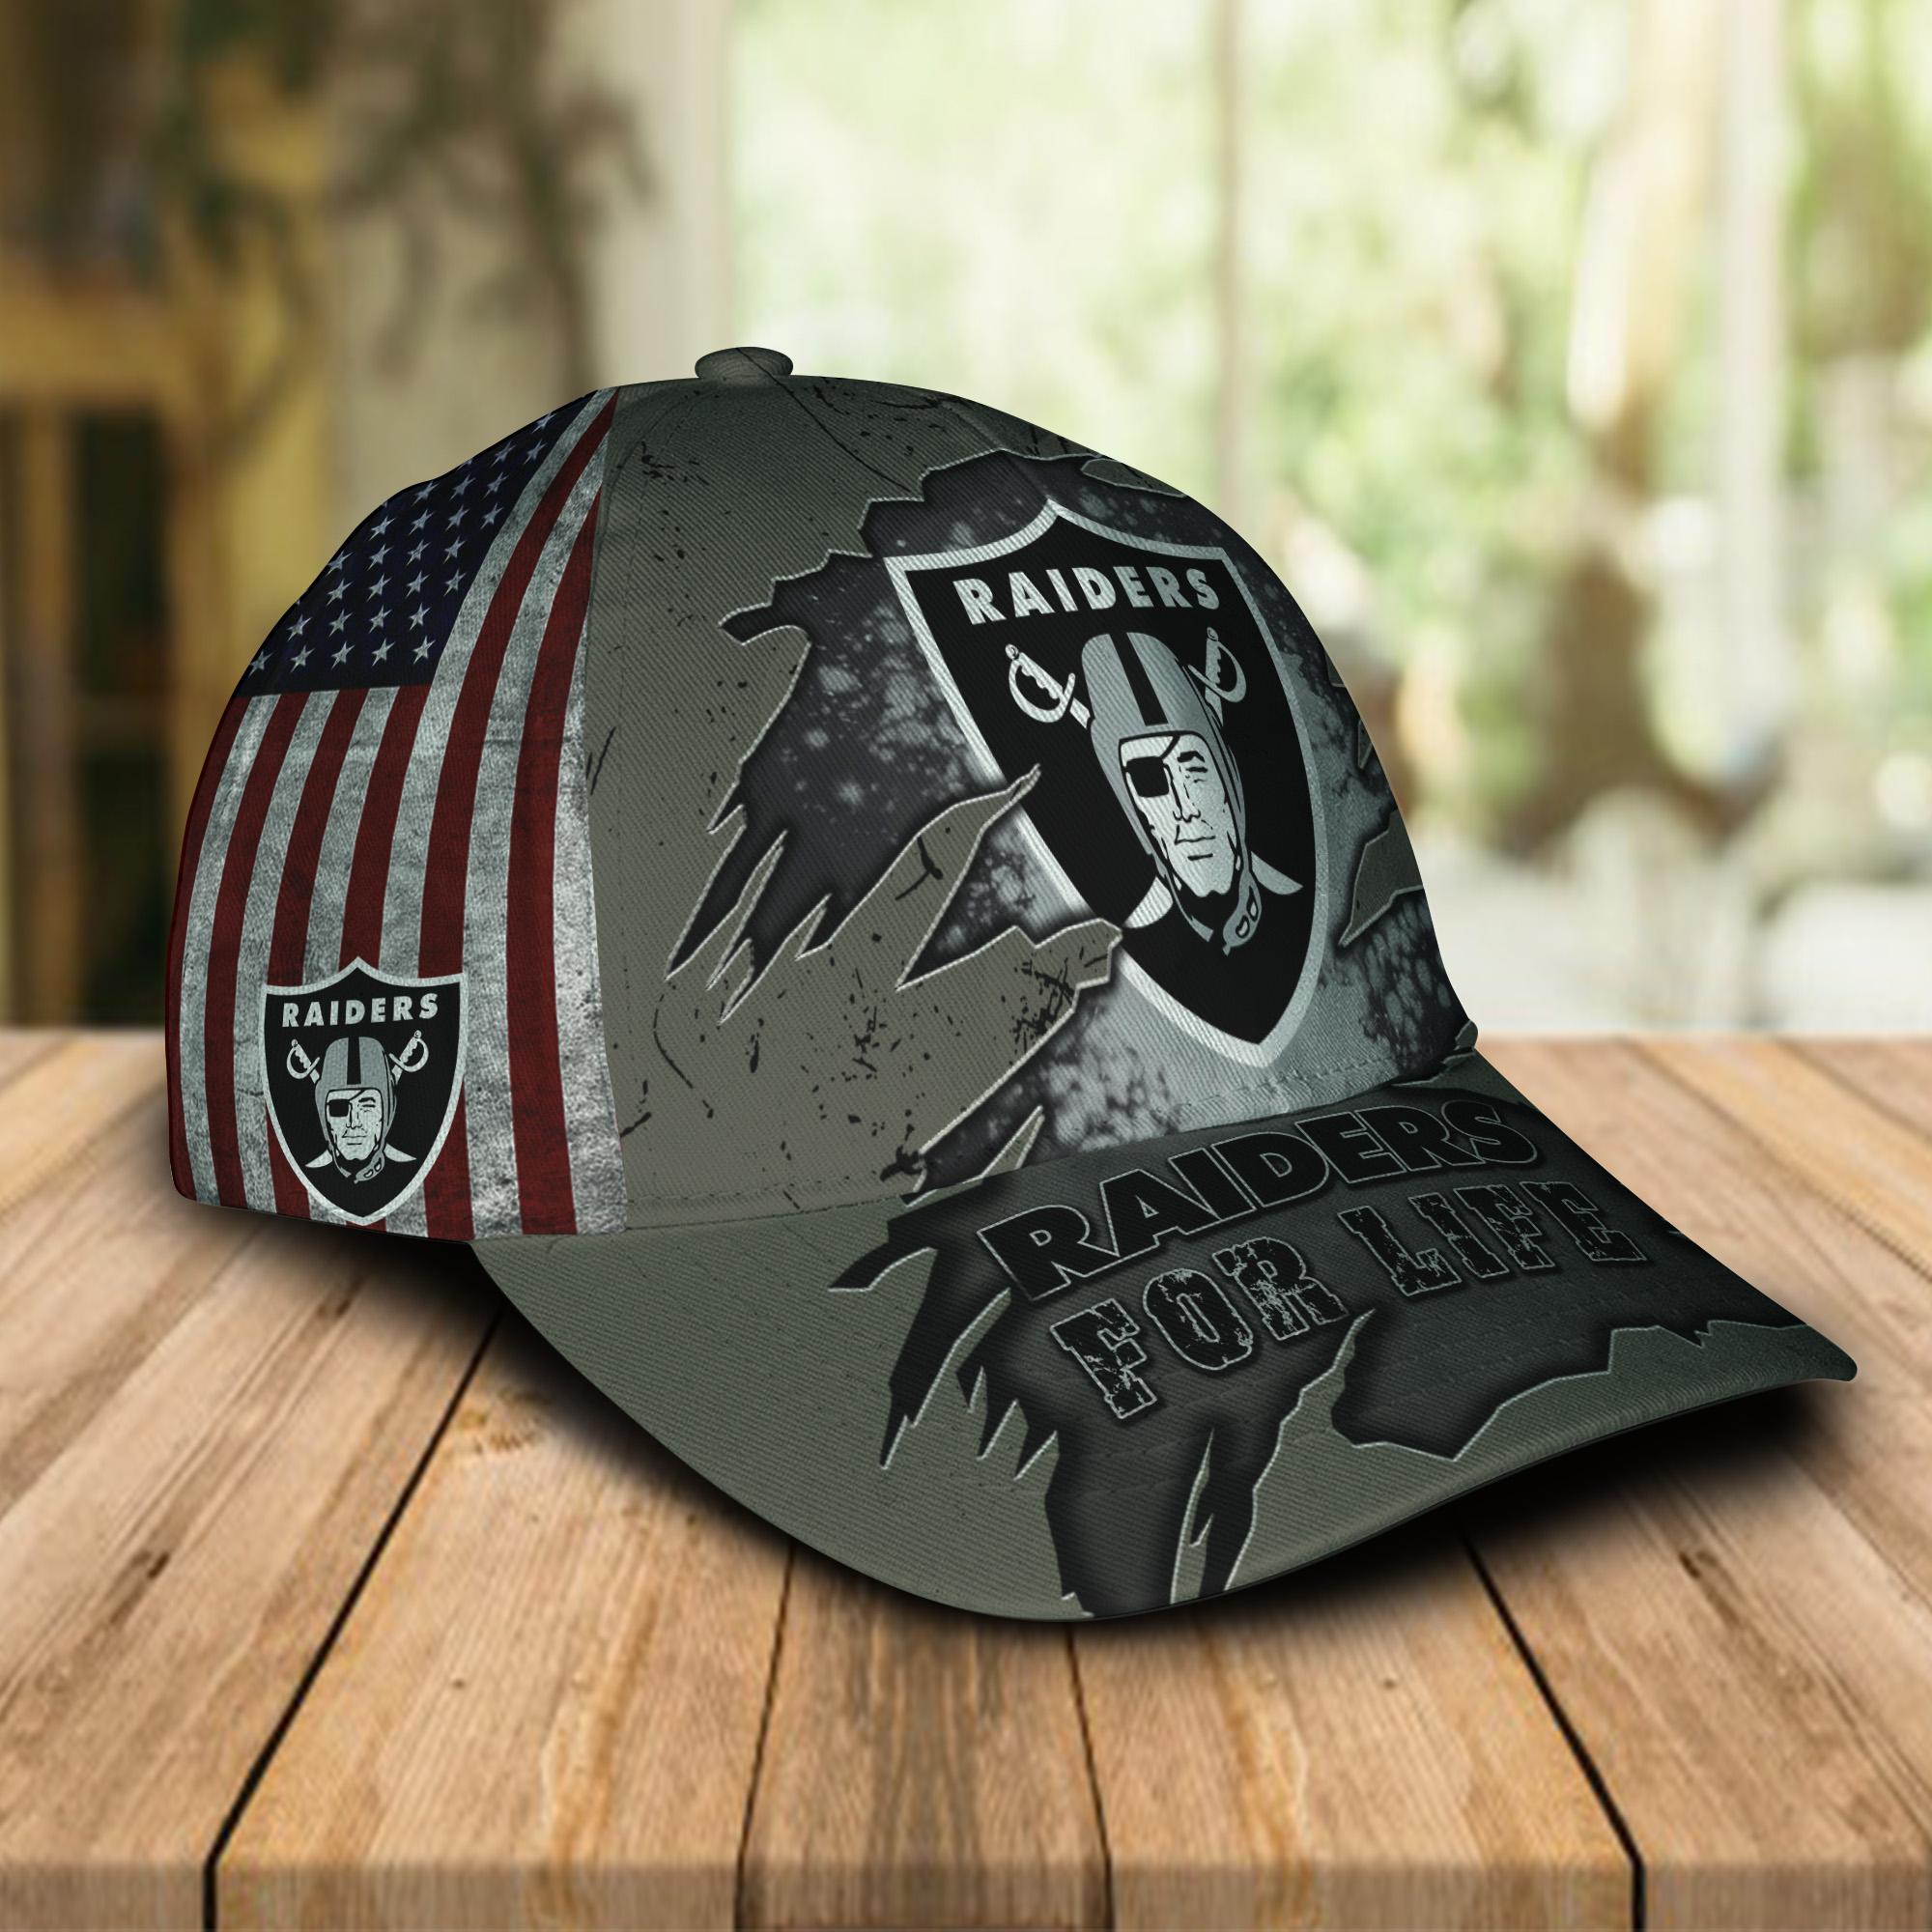 Las Vegas Raiders For Life Caps